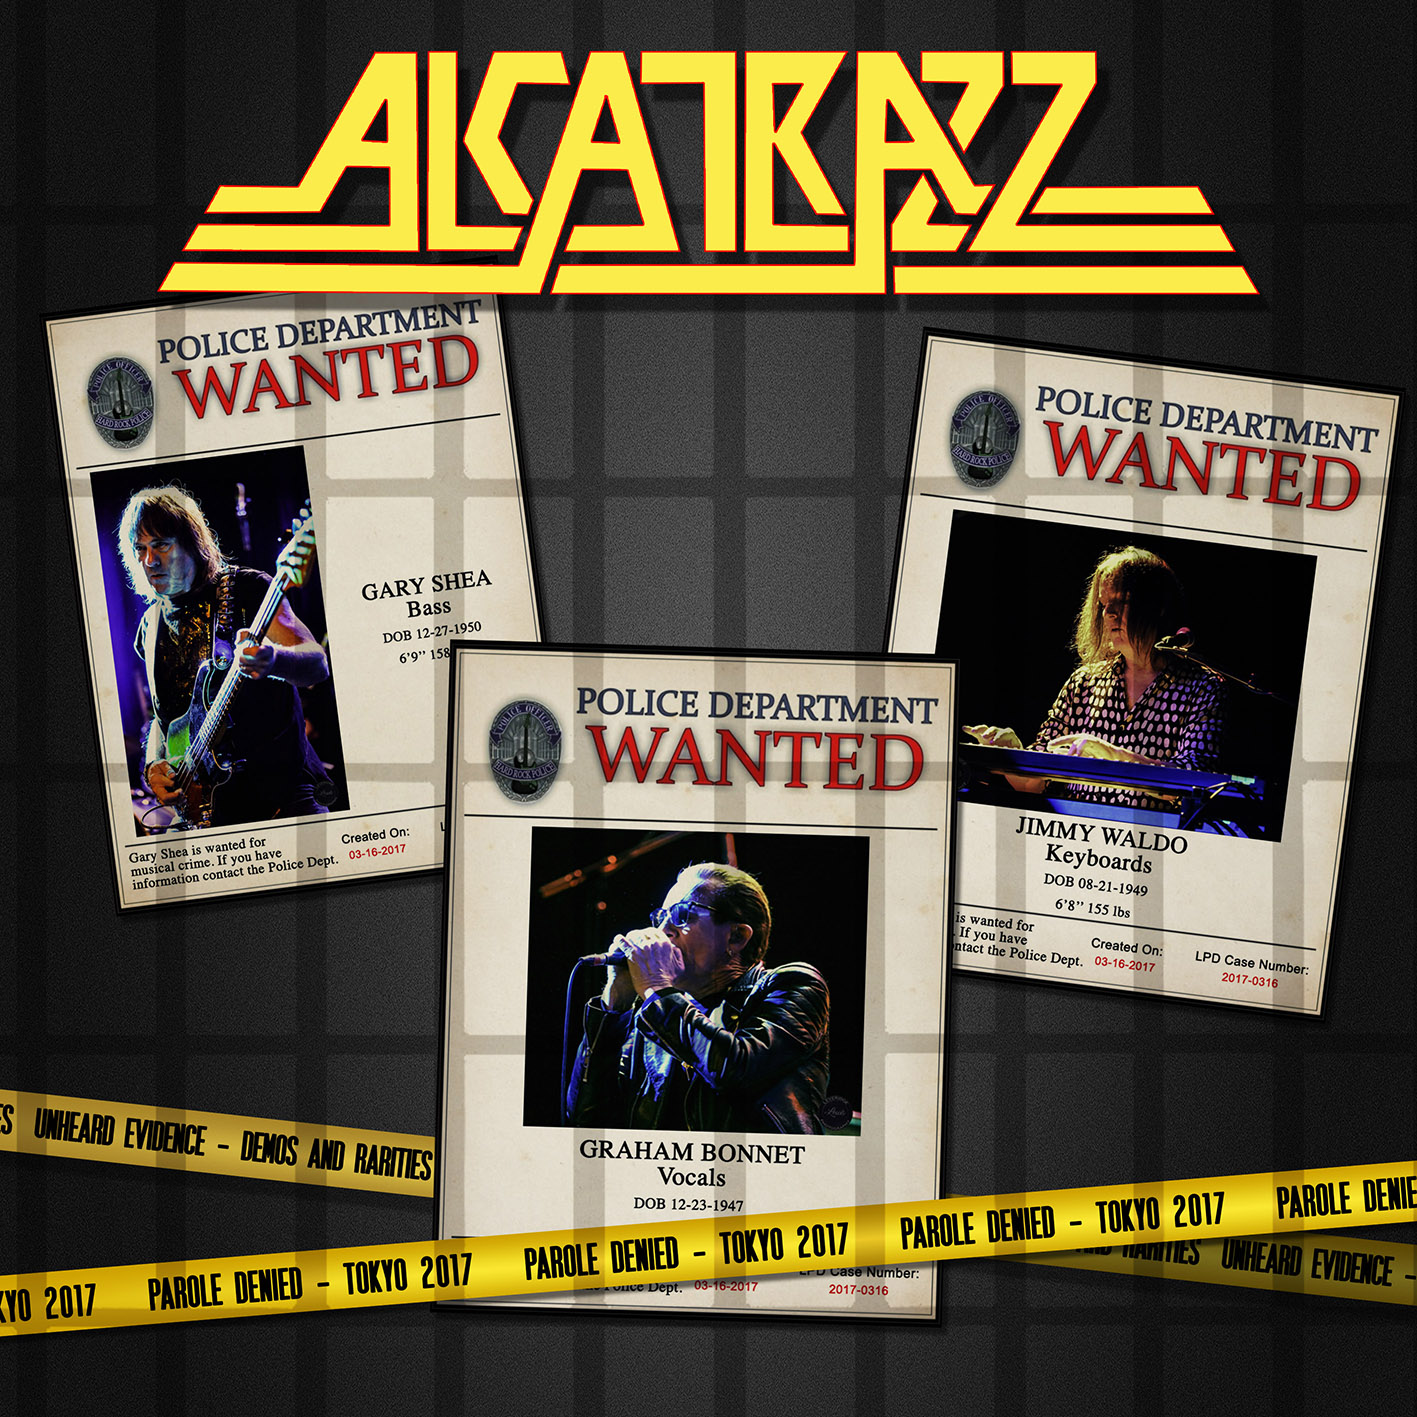 ALCATRAZZ-HBLS